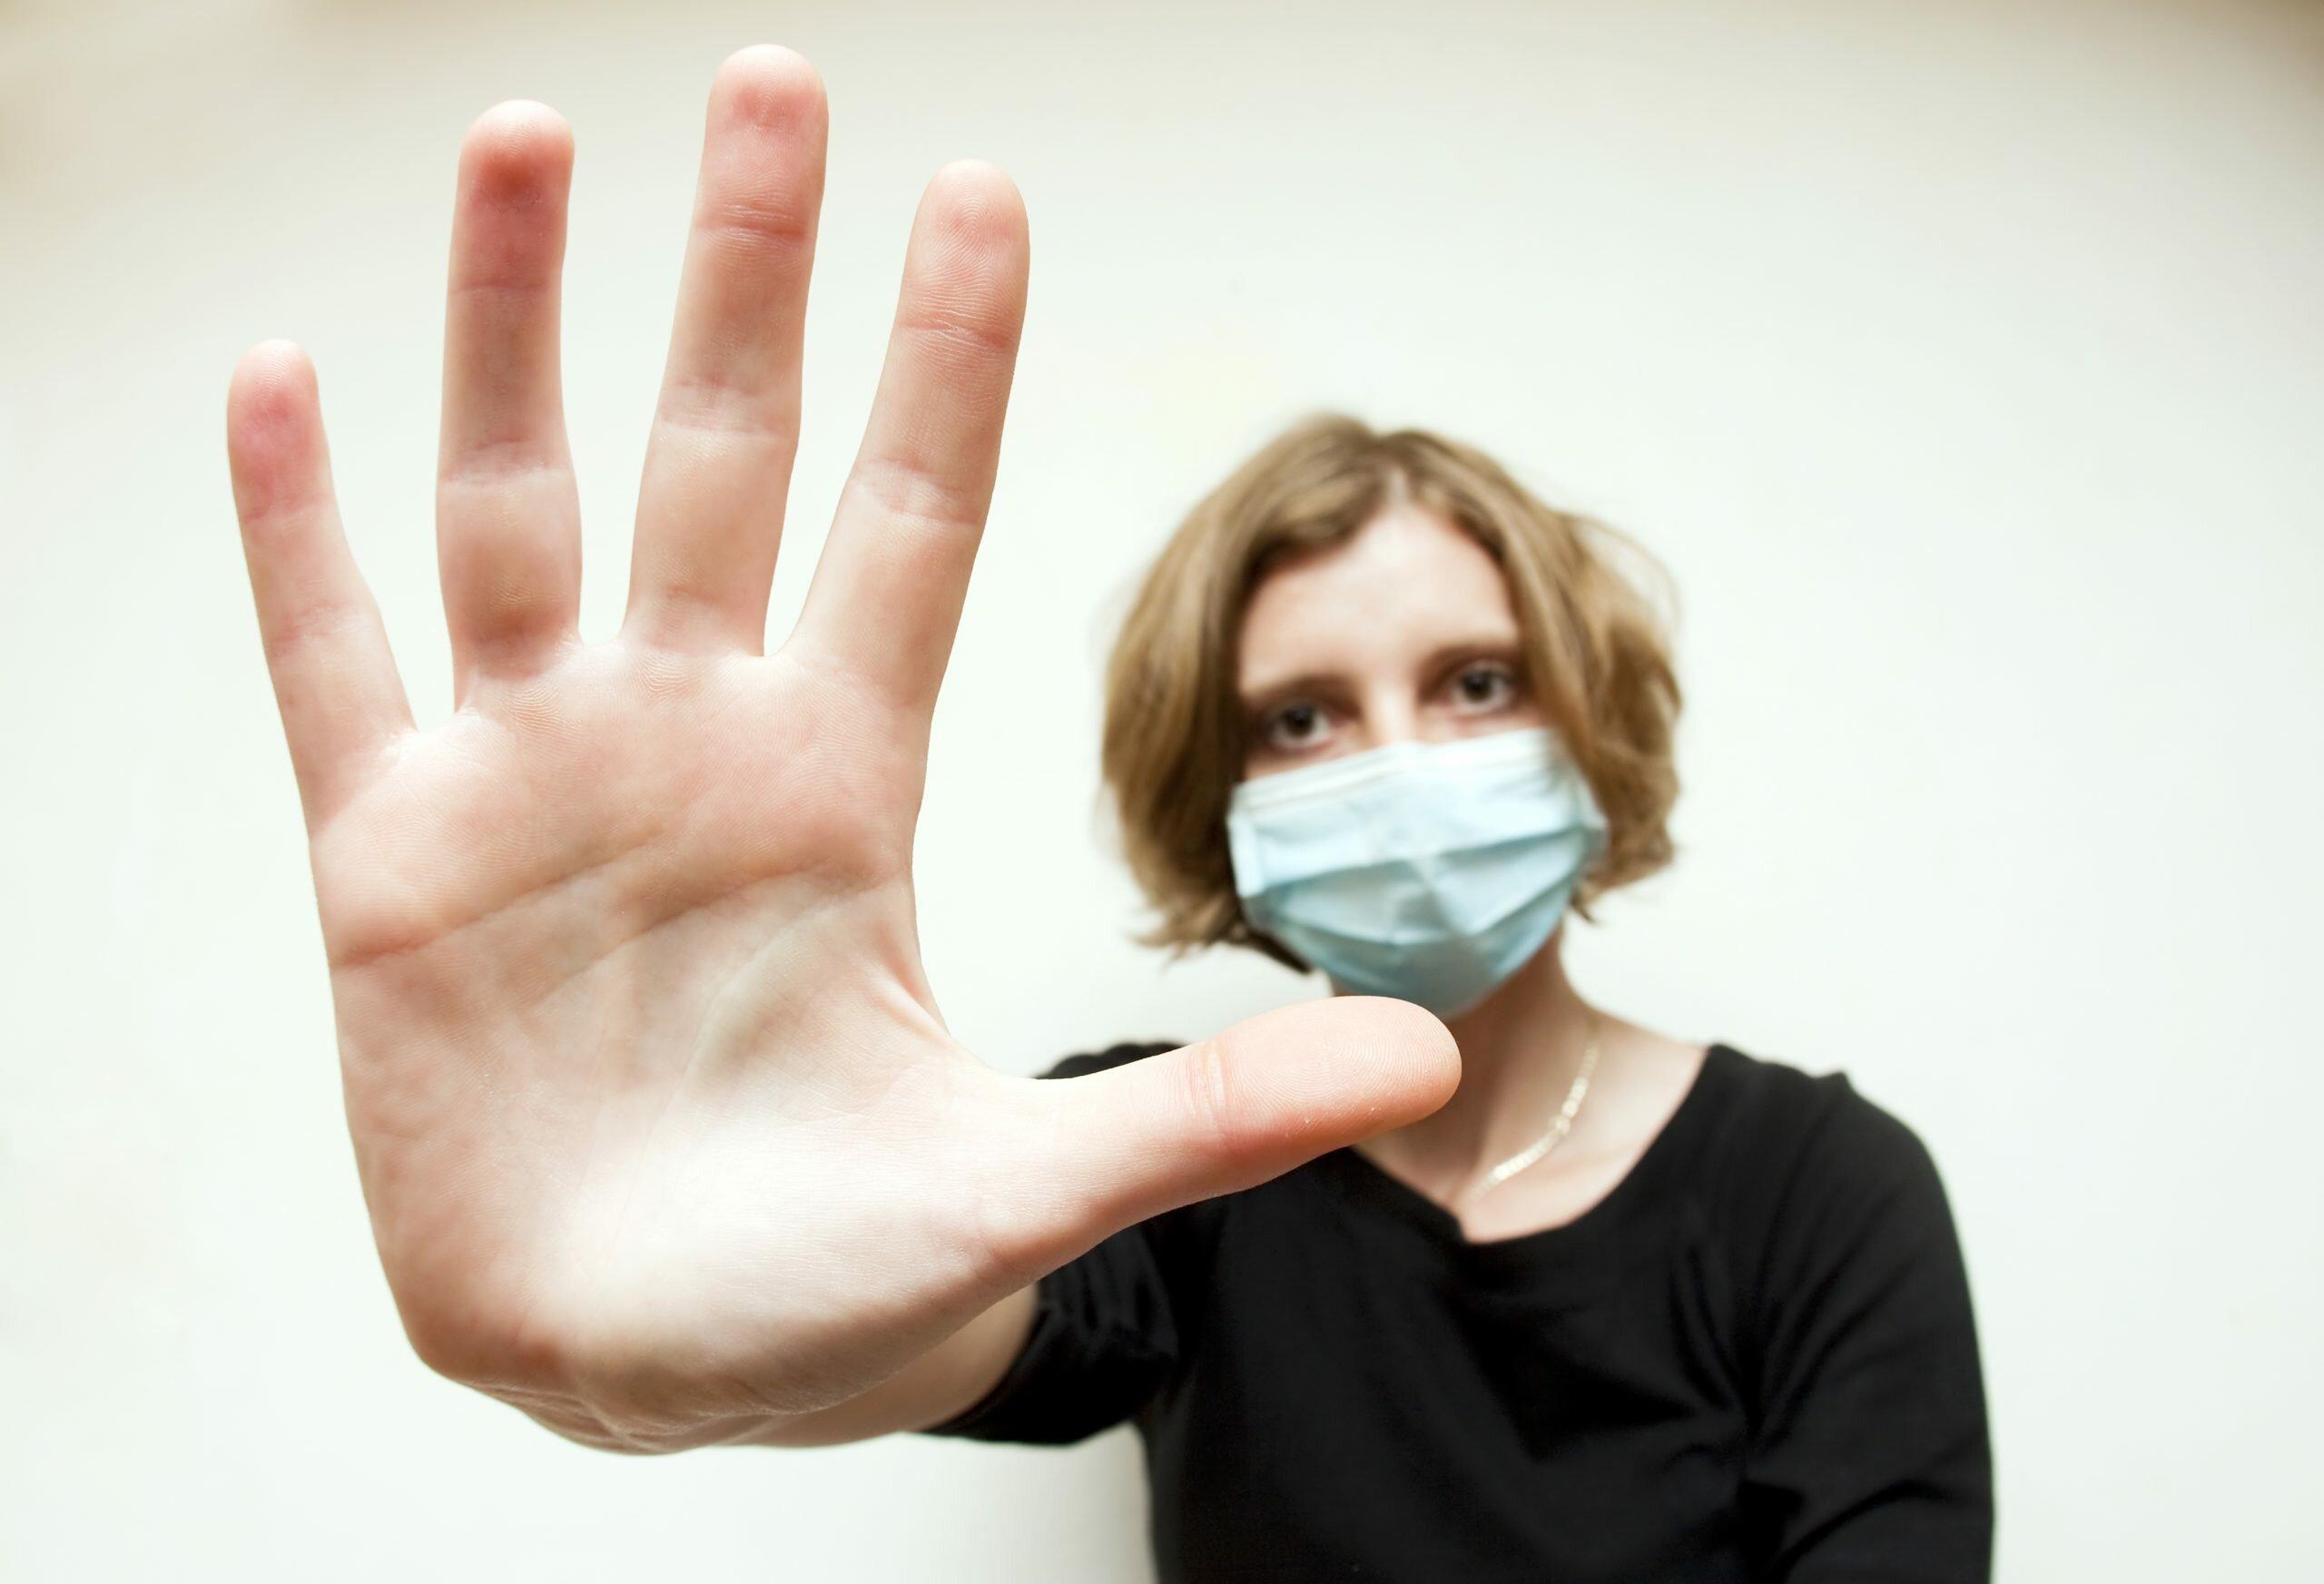 Безопасность во время коронавируса